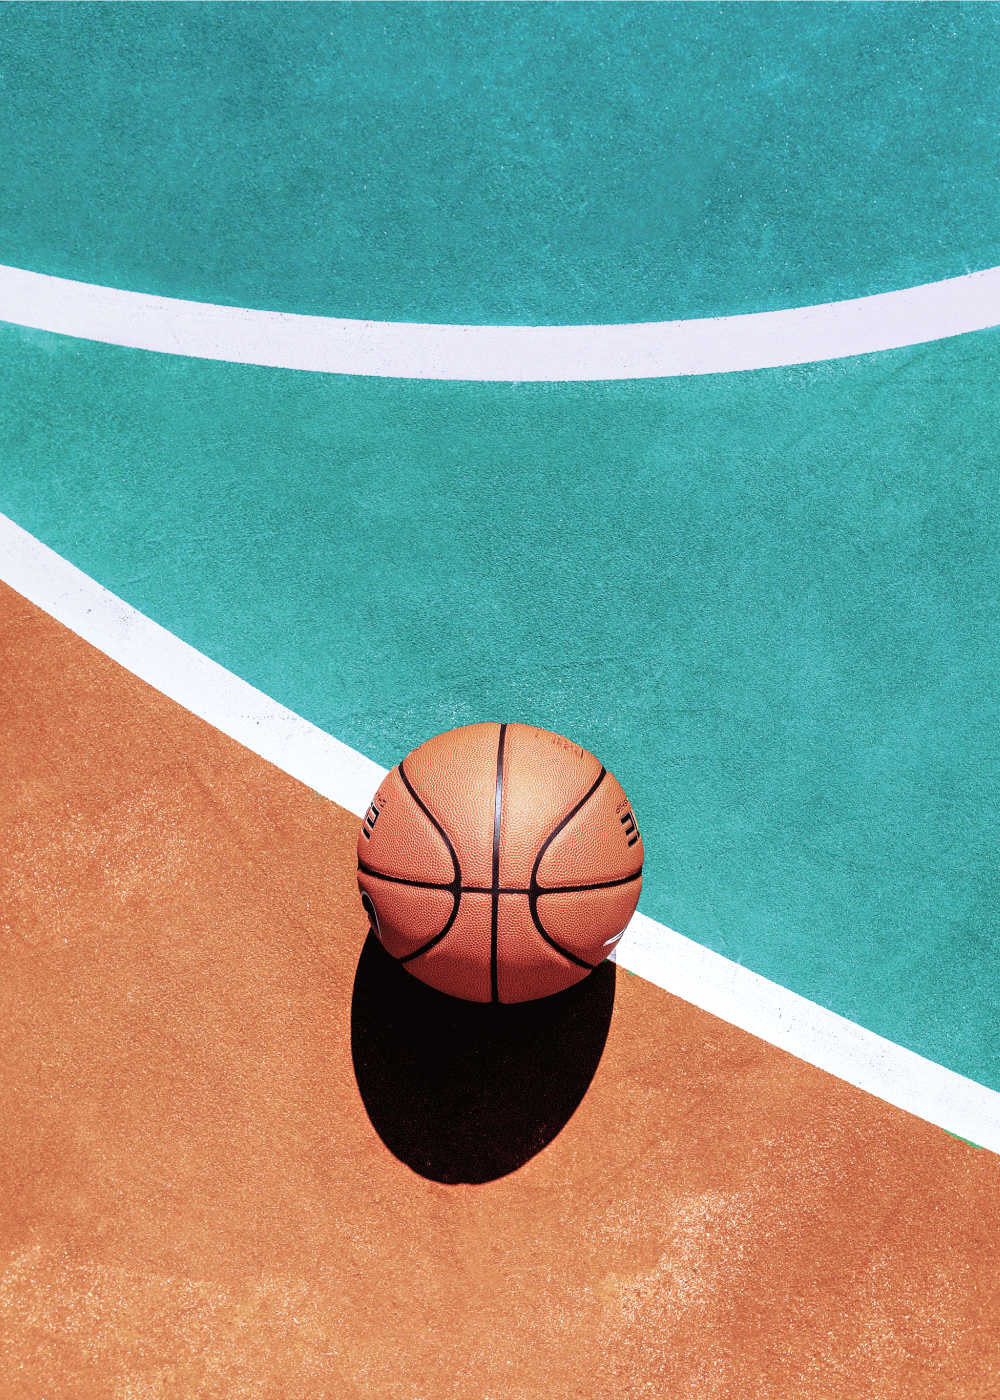 Basket lines plakat